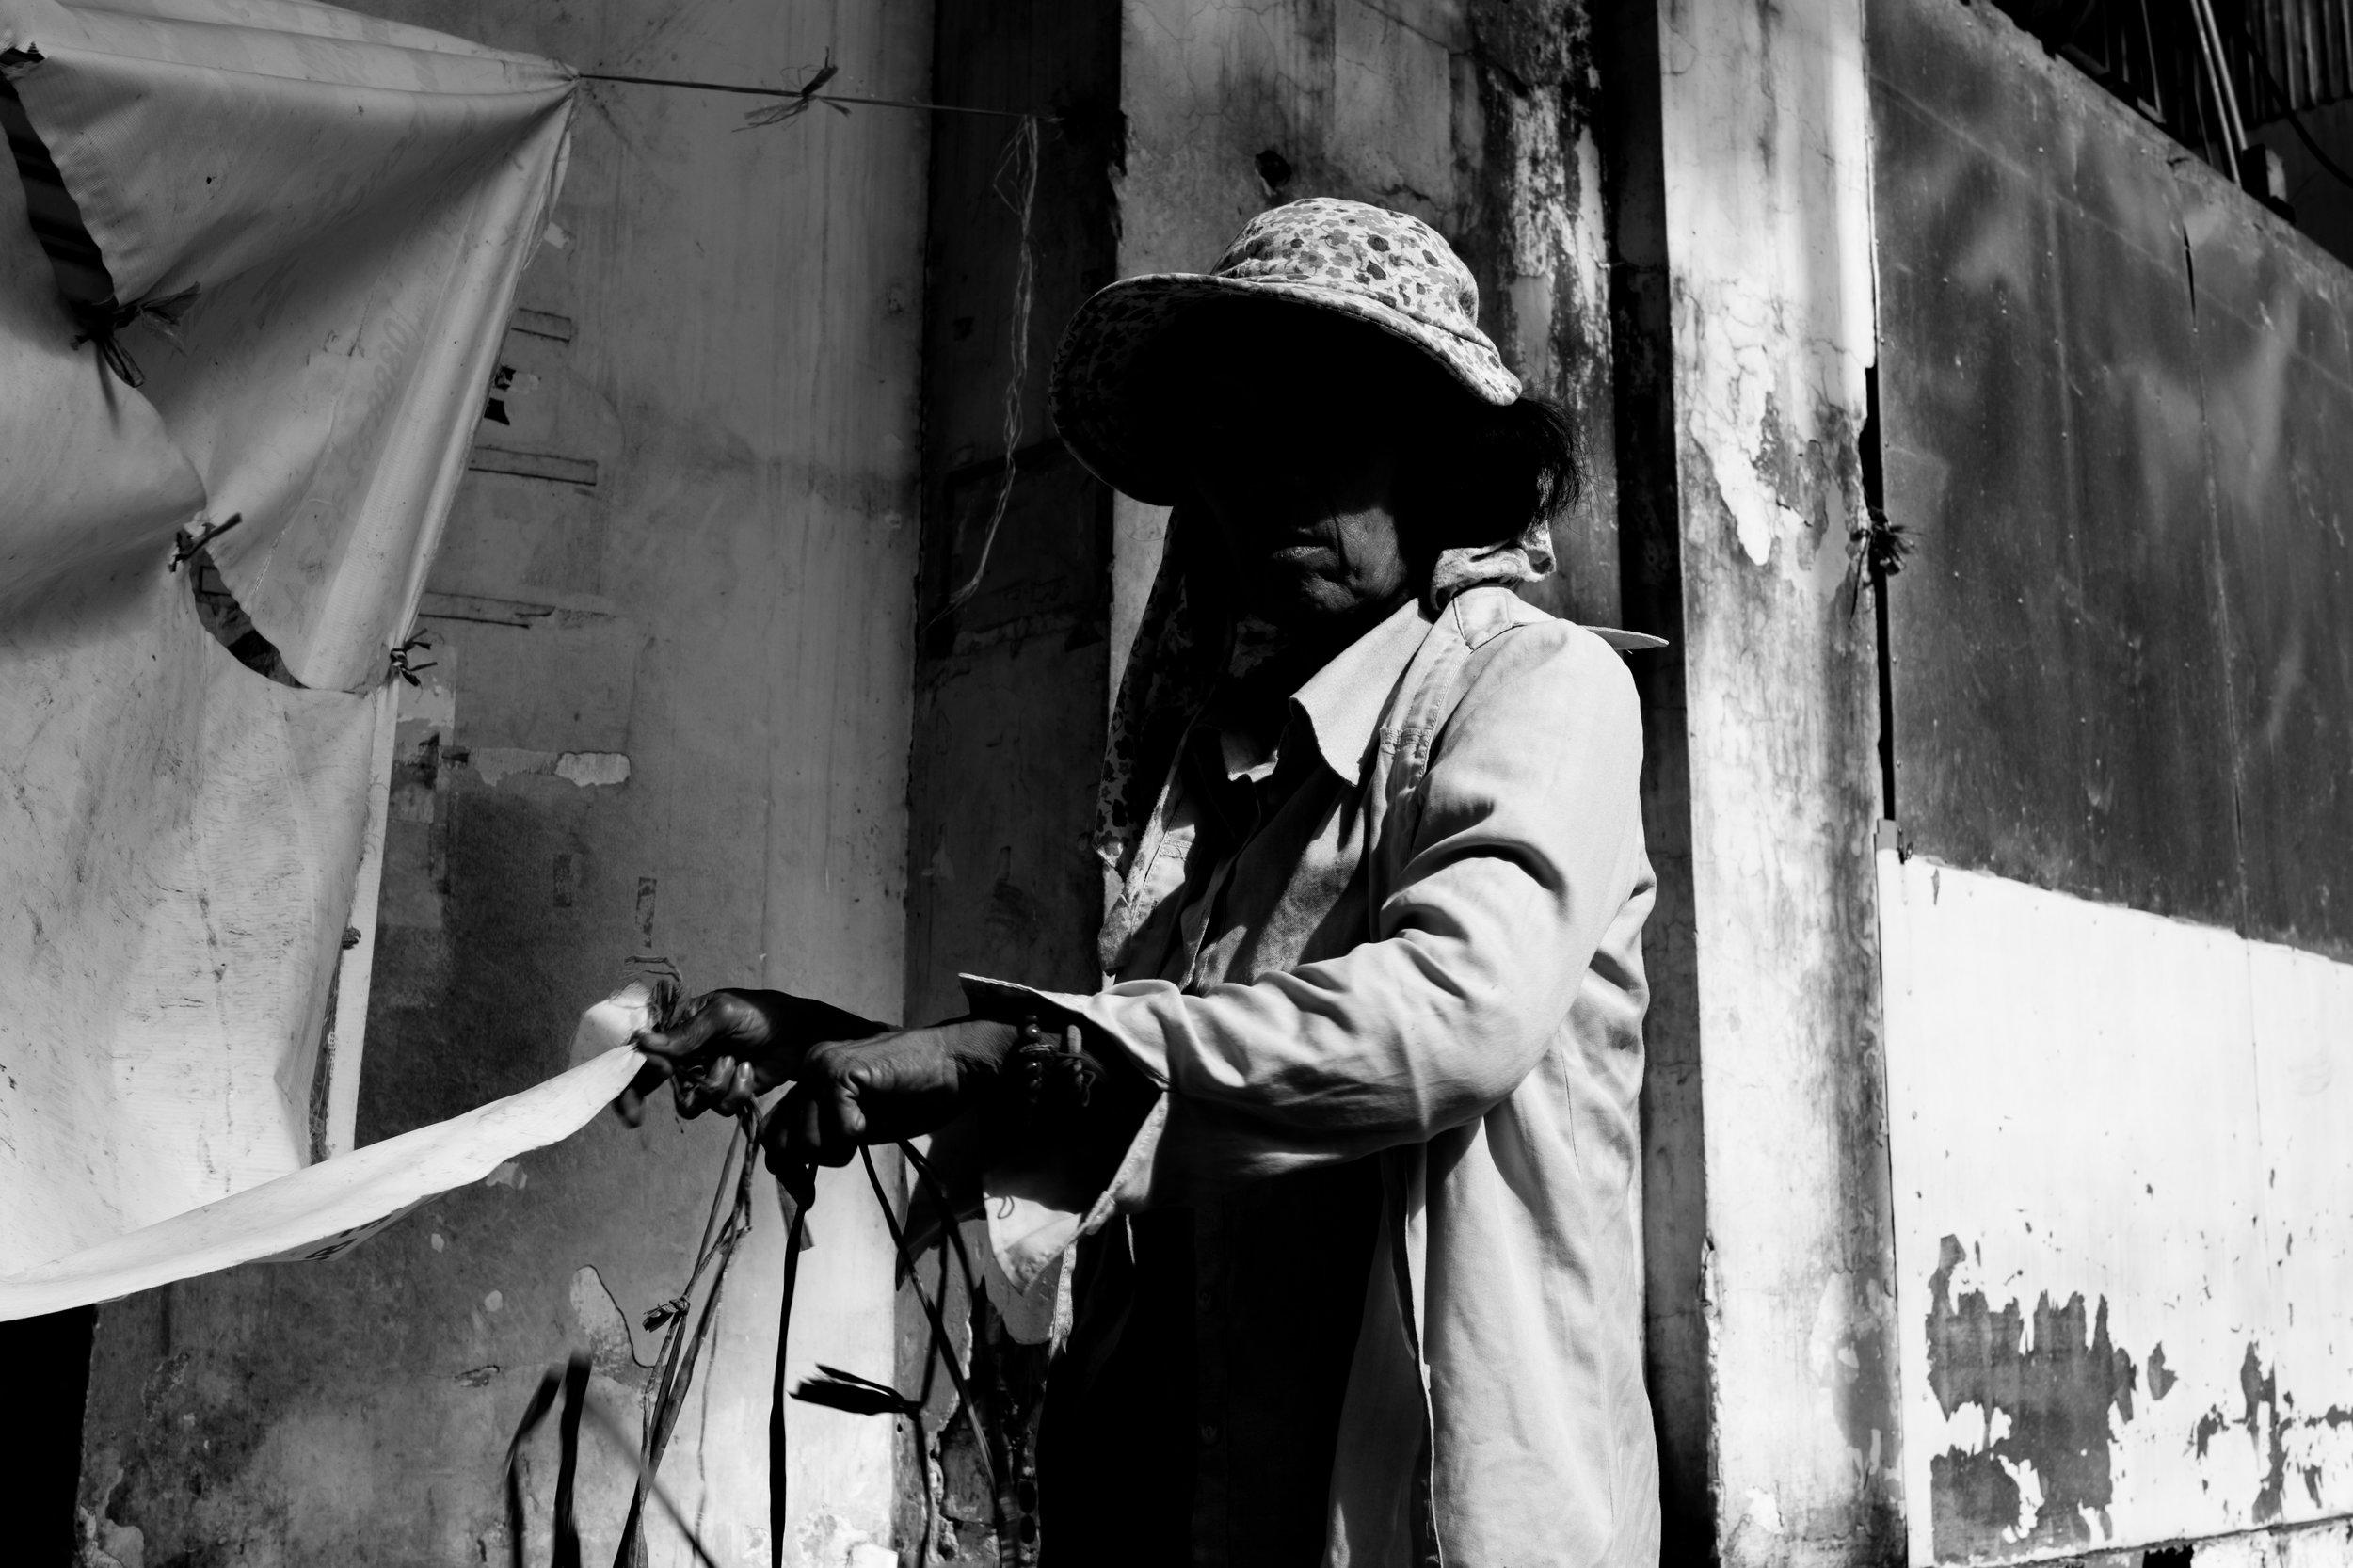 Untitled,Ho Chi Minh -December 2017